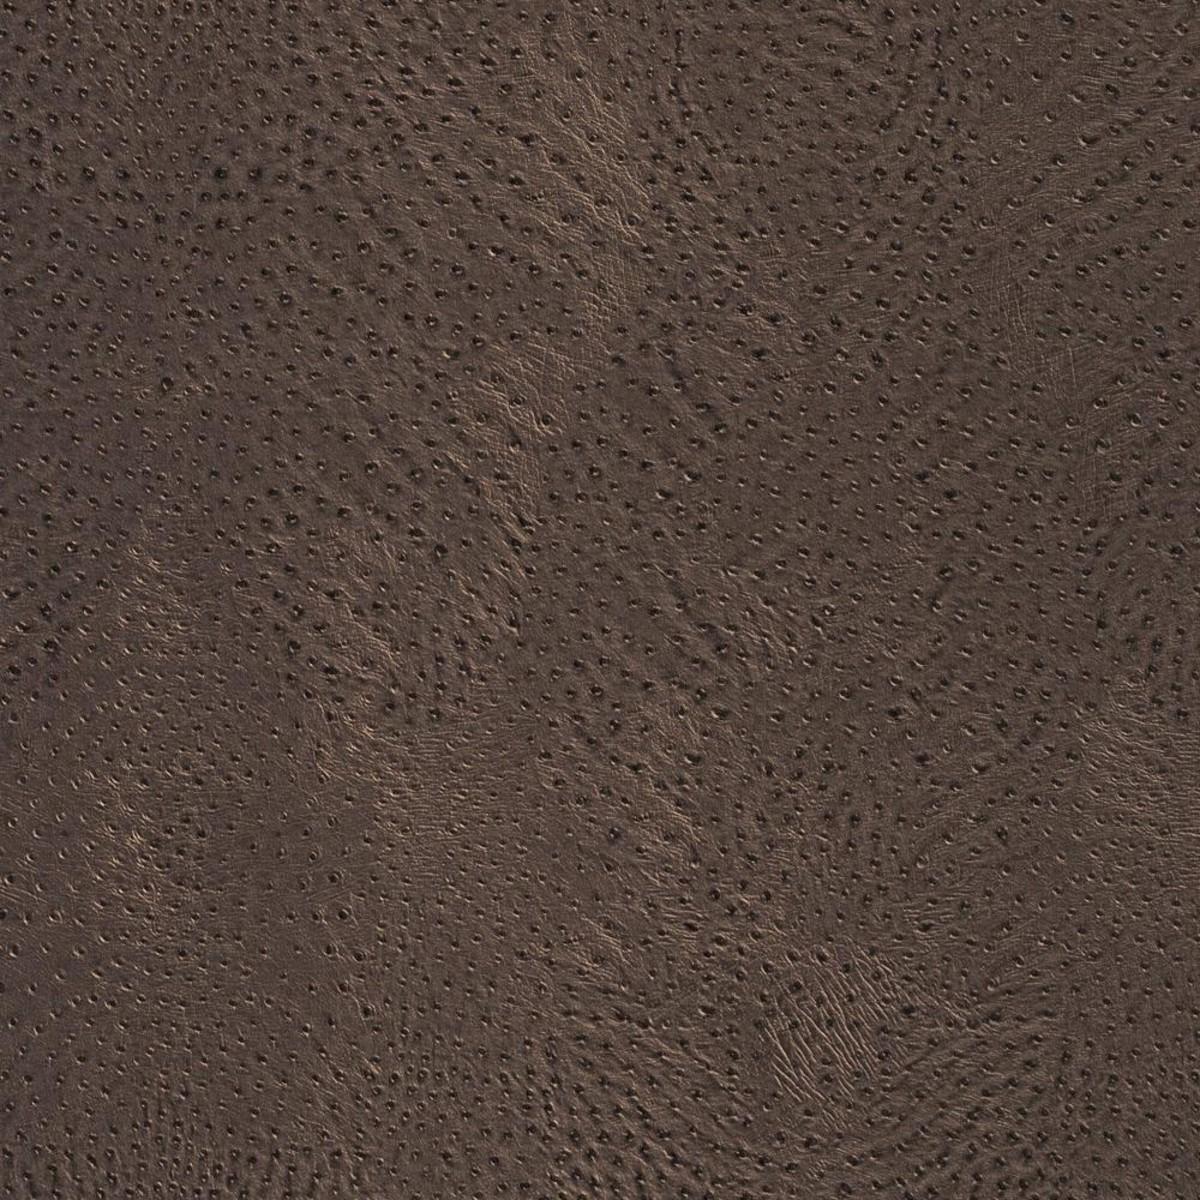 Обои флизелиновые Rasch African Queen коричневые 0.53 м 423617